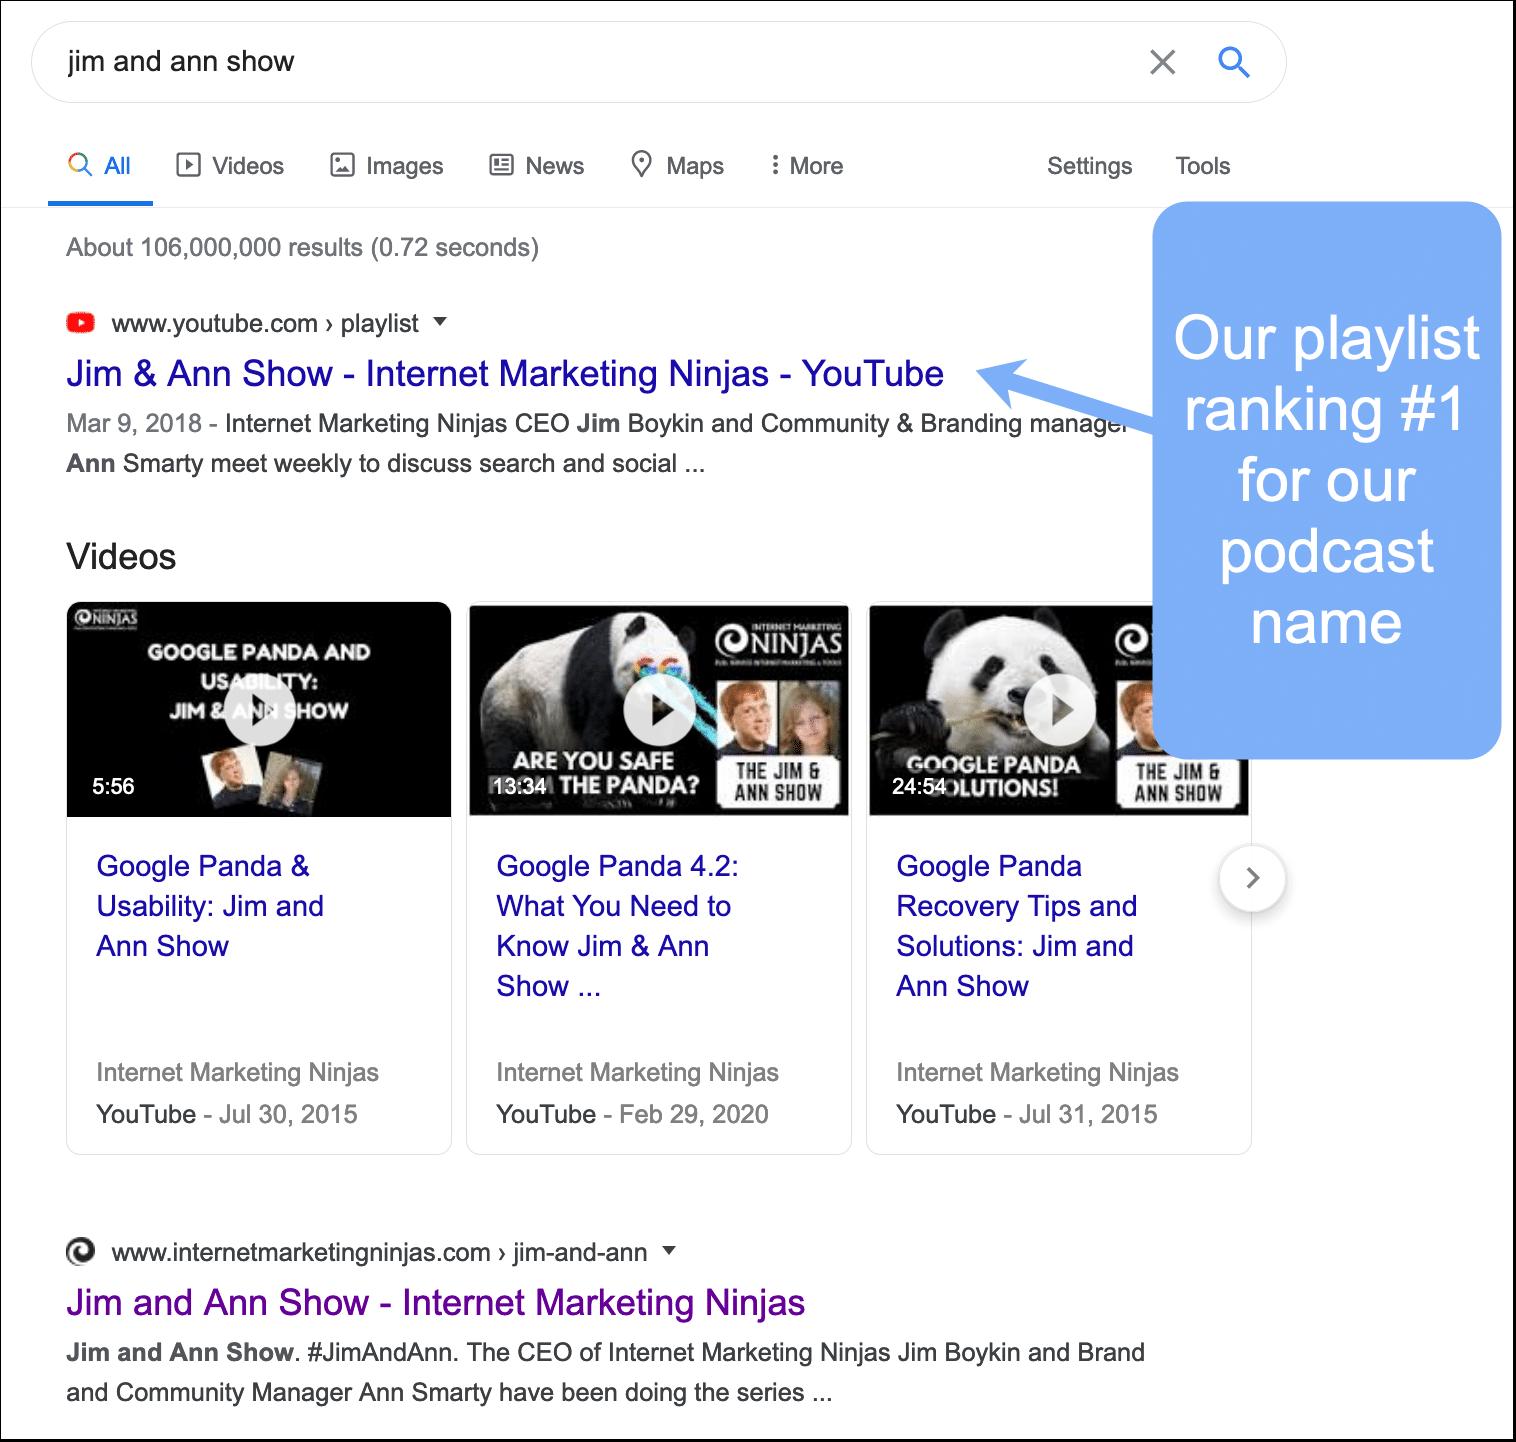 Playlist ranking